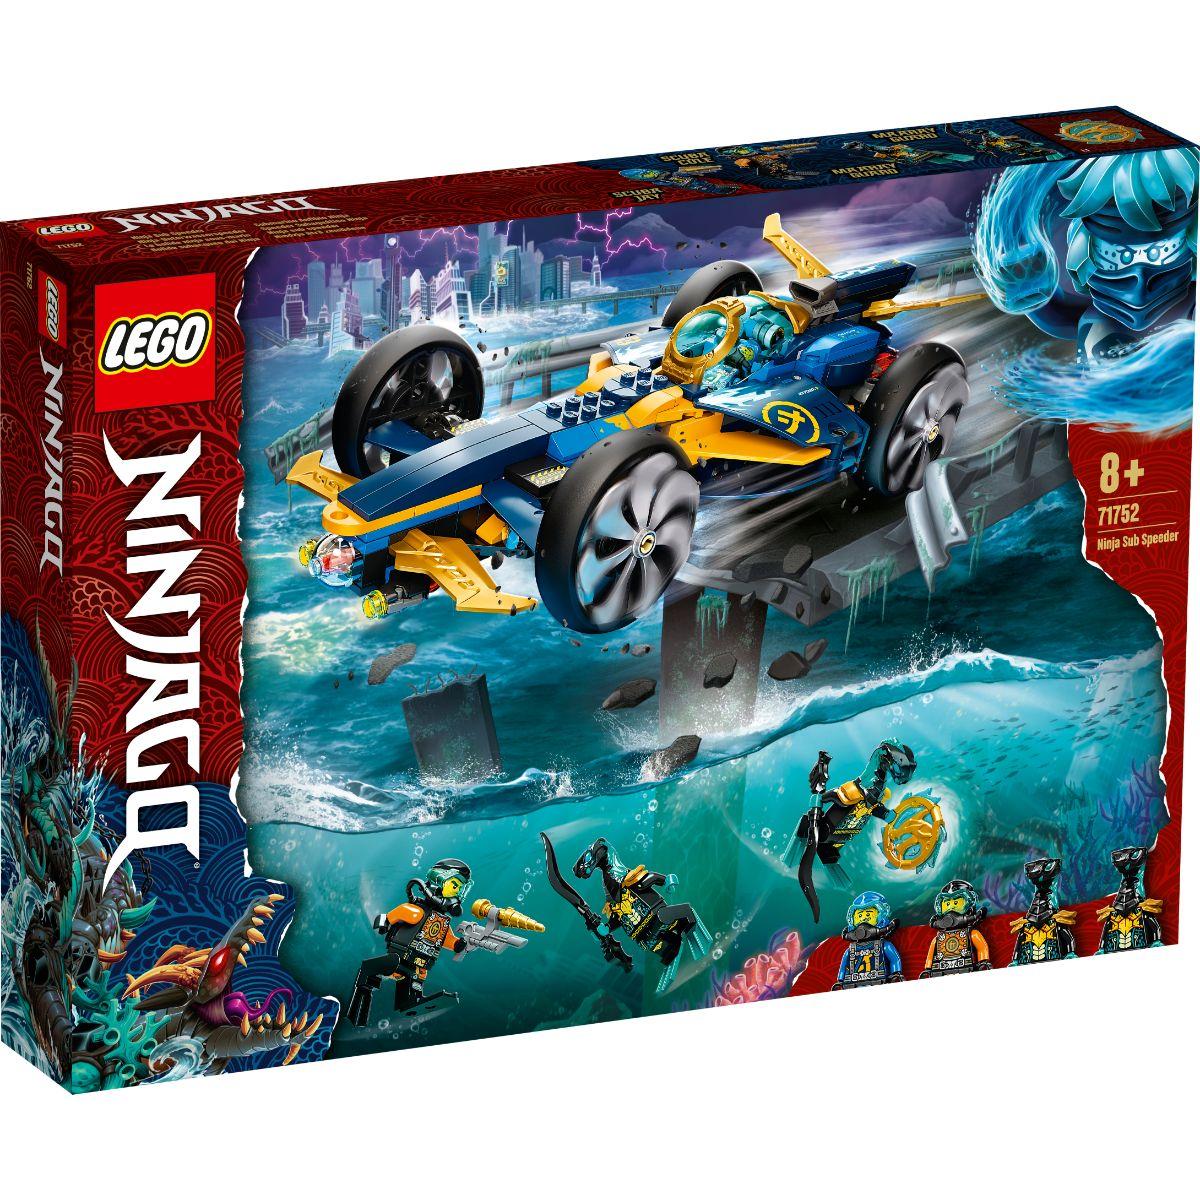 LEGO® Ninjago - Sub Speeder Ninja (71752)